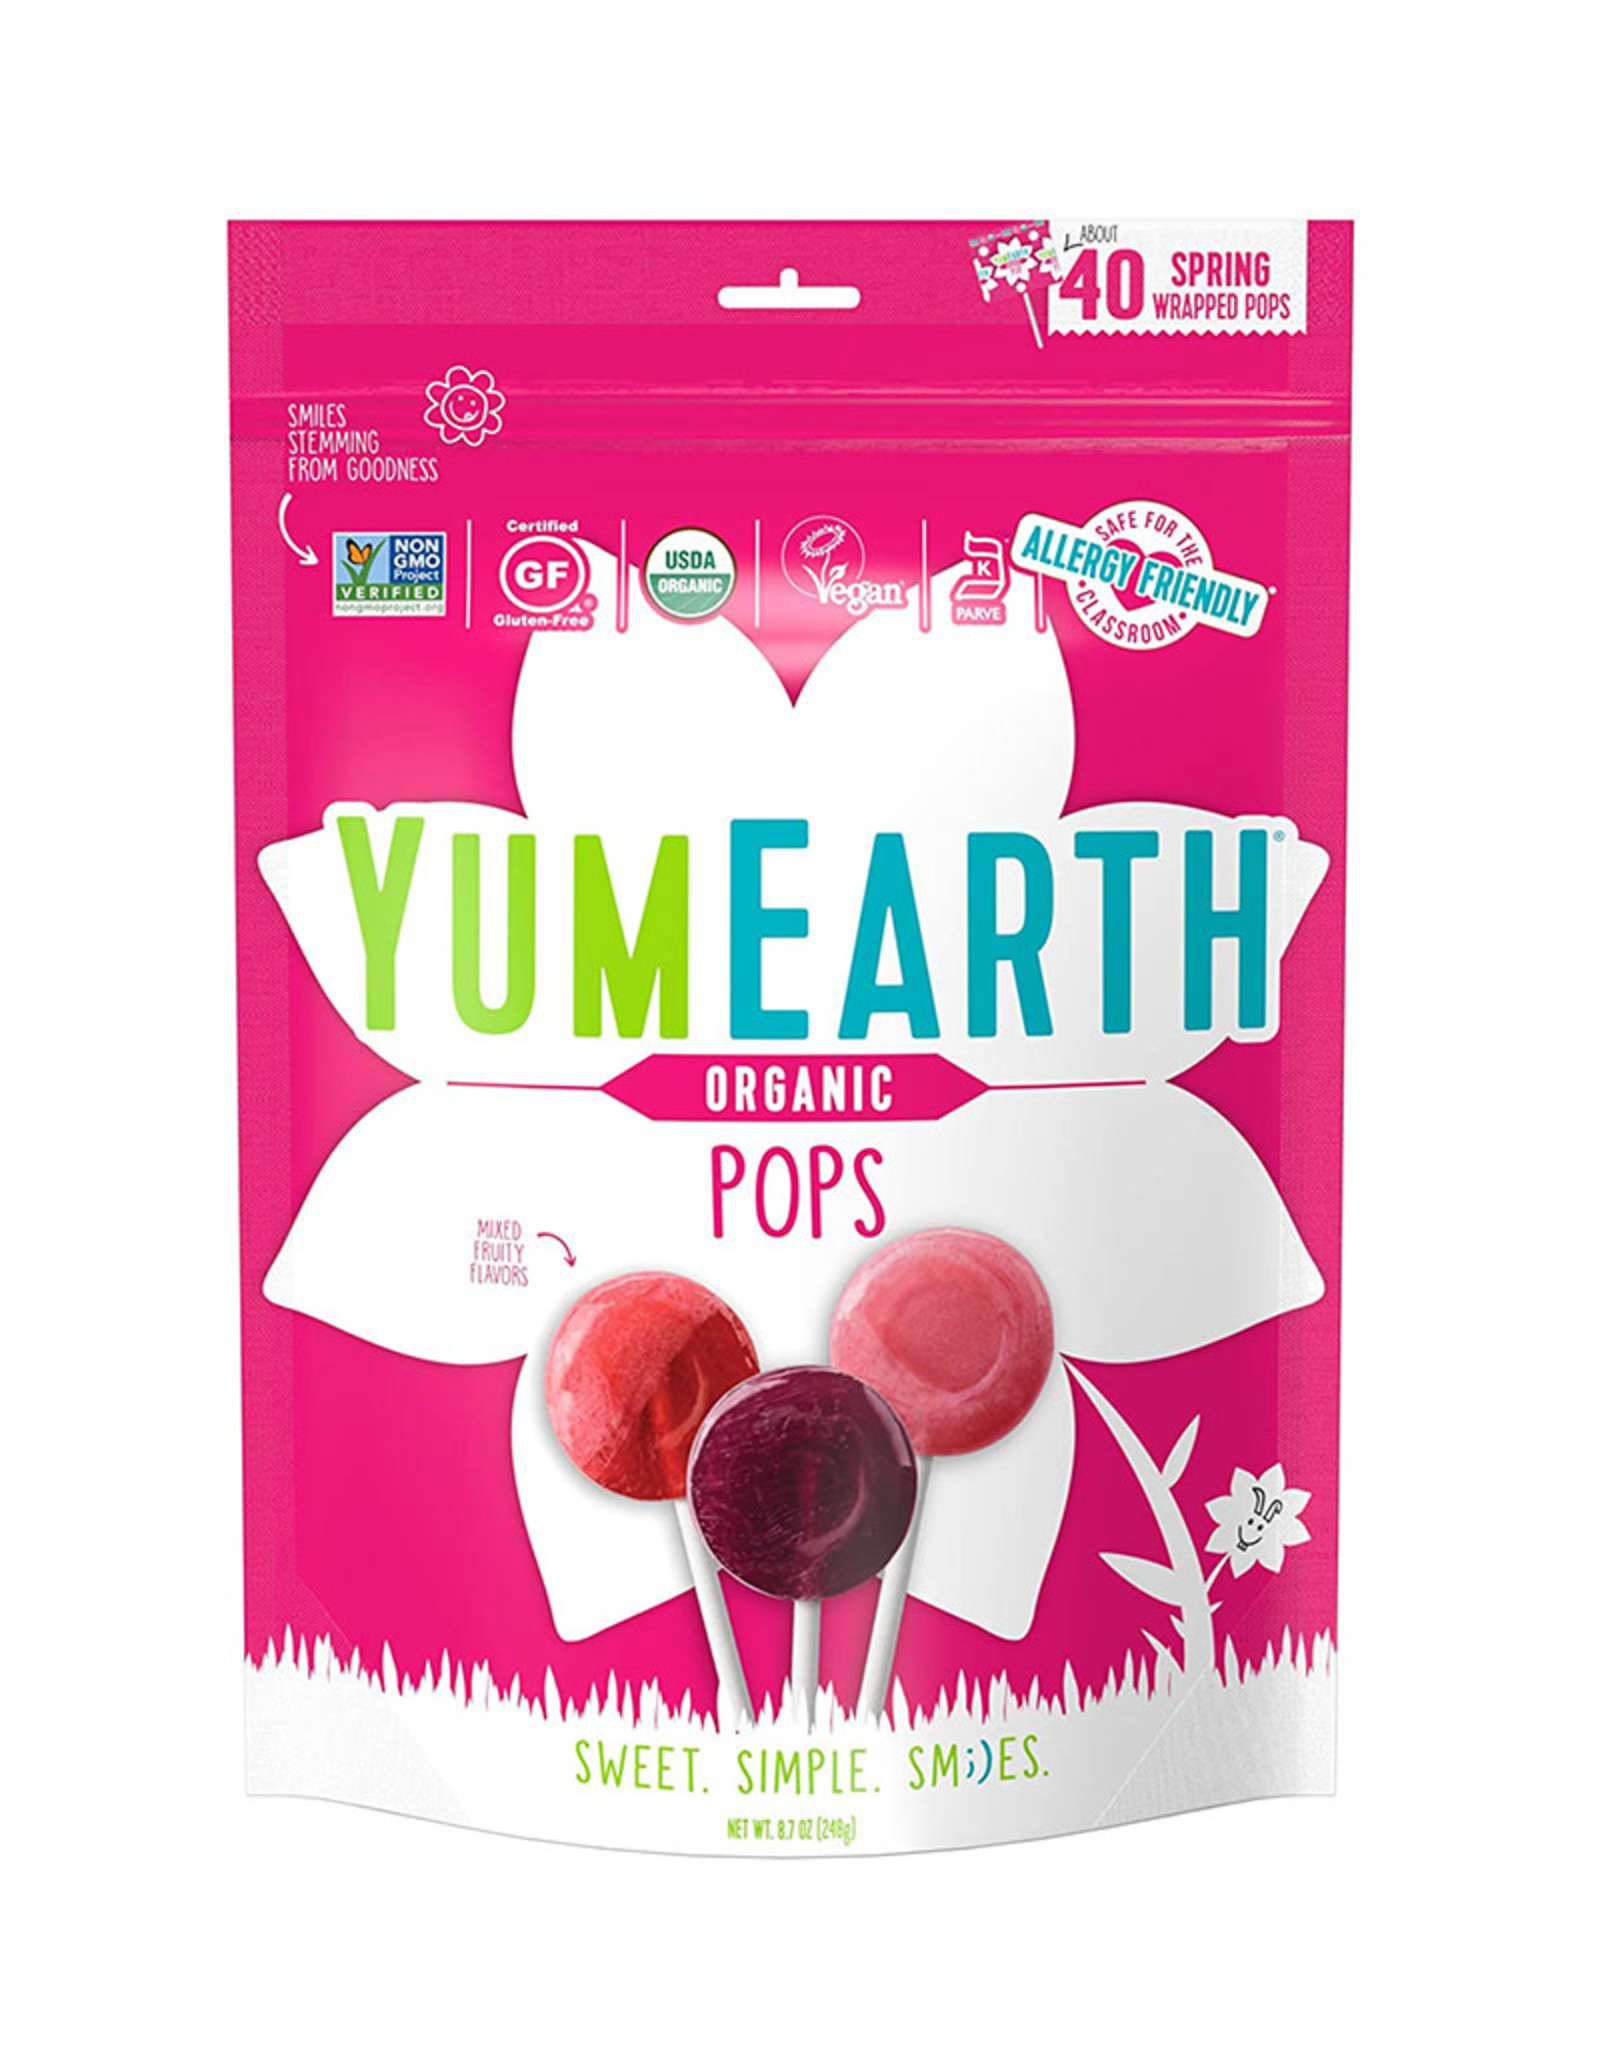 YummyEarth Inc. Yum Earth - Candy, Organic Easter Fruit Pops (247g)